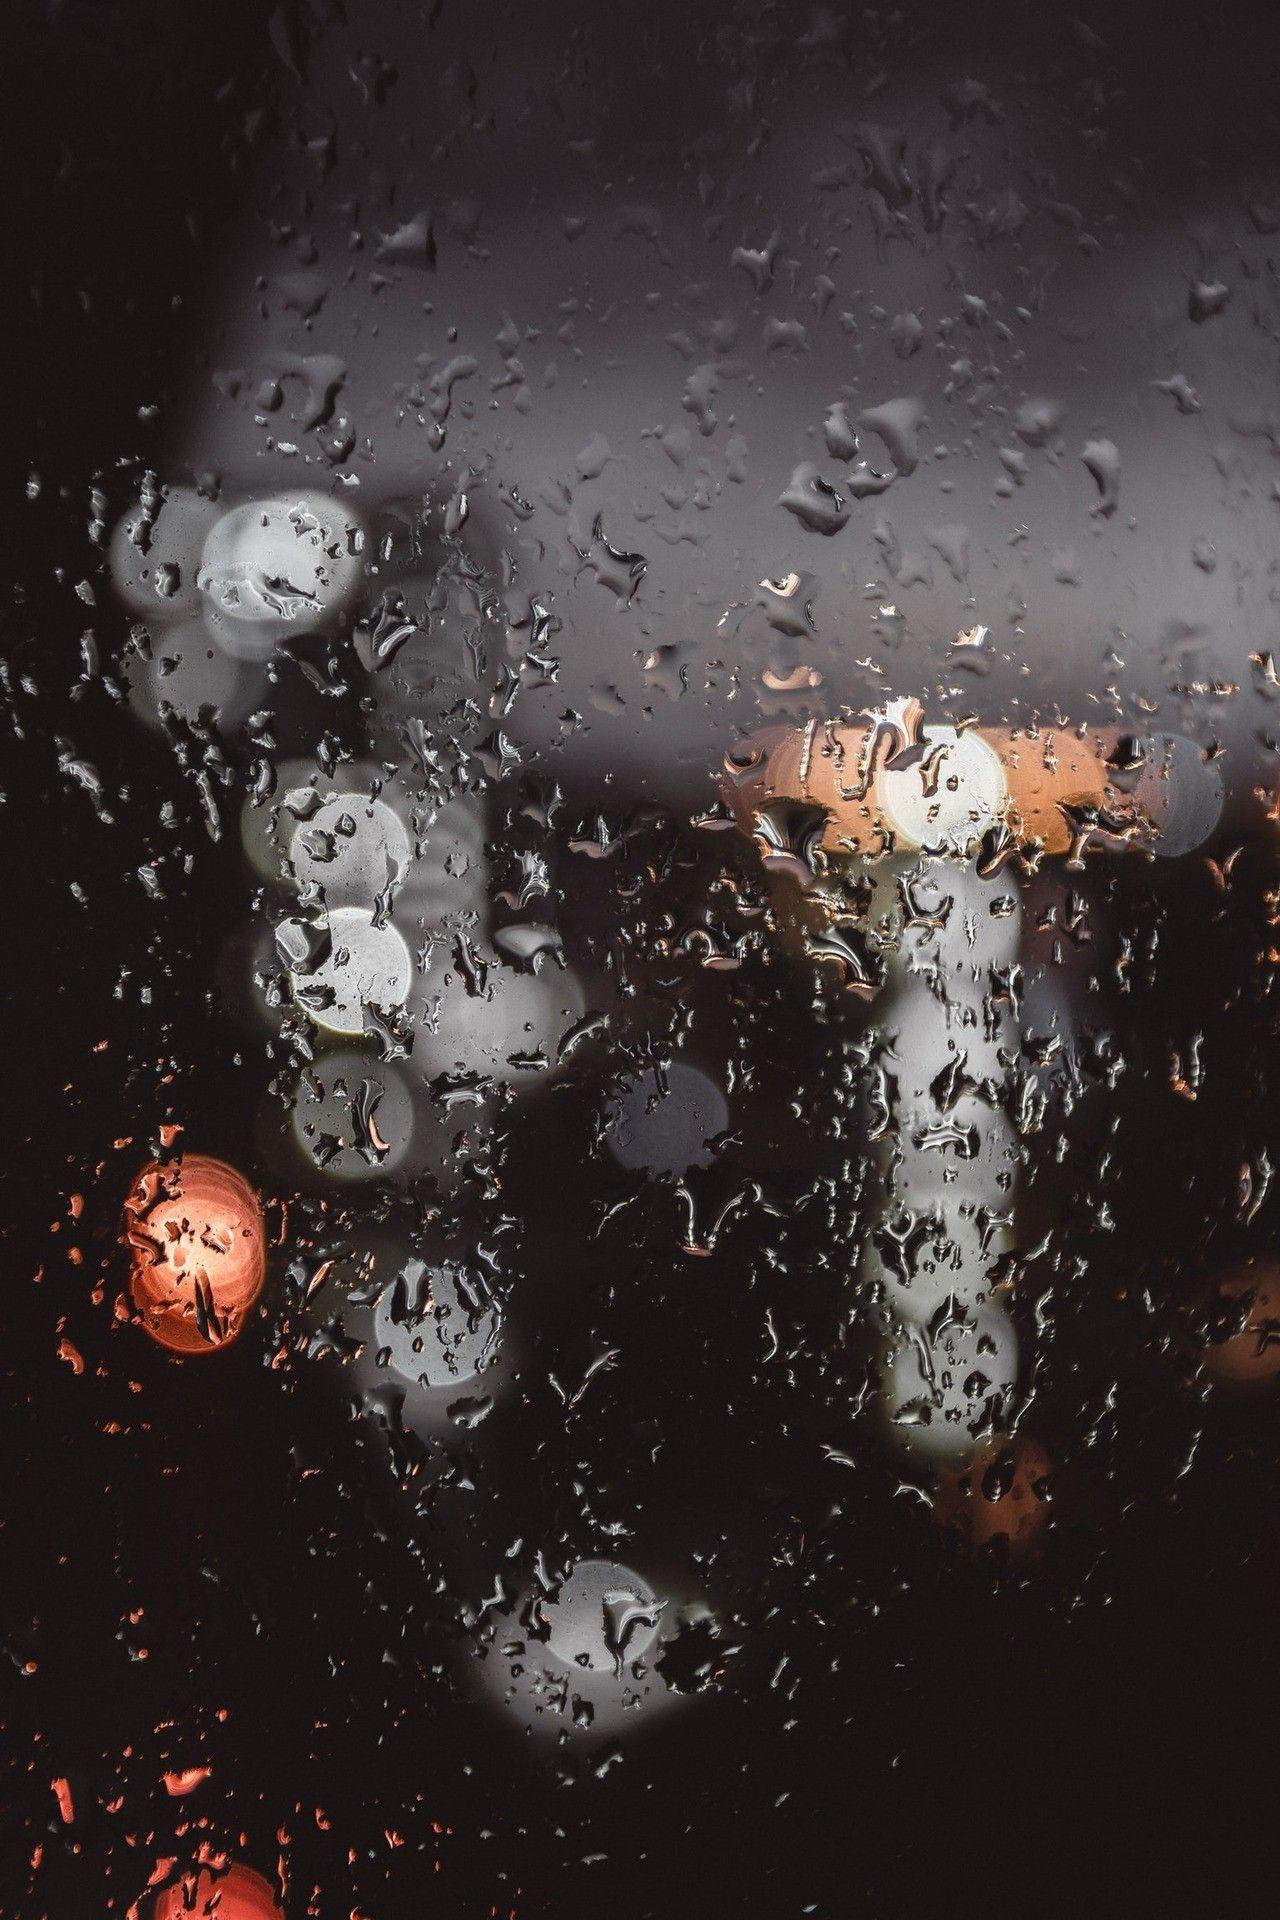 Pin by Maryam on Rain ☔ Rain wallpapers, Wallpaper